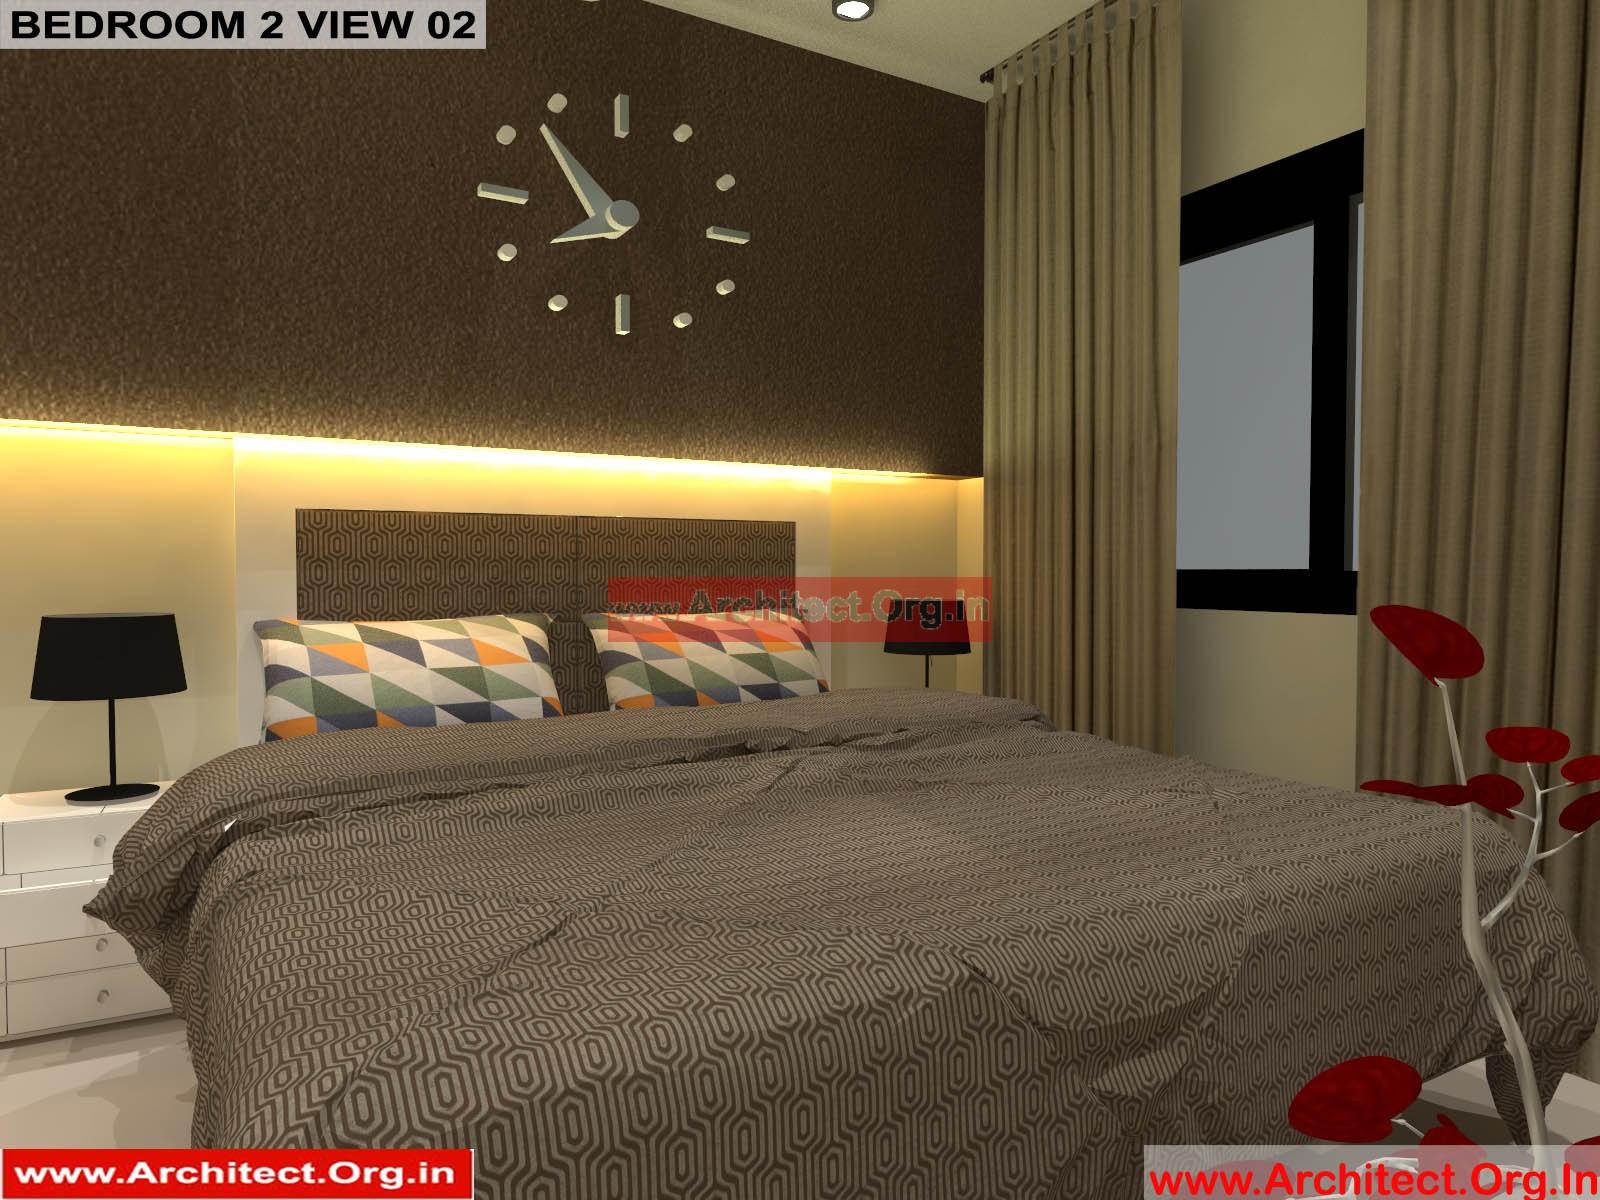 Mr Pankaj Fr Ms Rakhi Nagpur Maharashtra House Interior Bedroom 2 View 02 Architect Org In